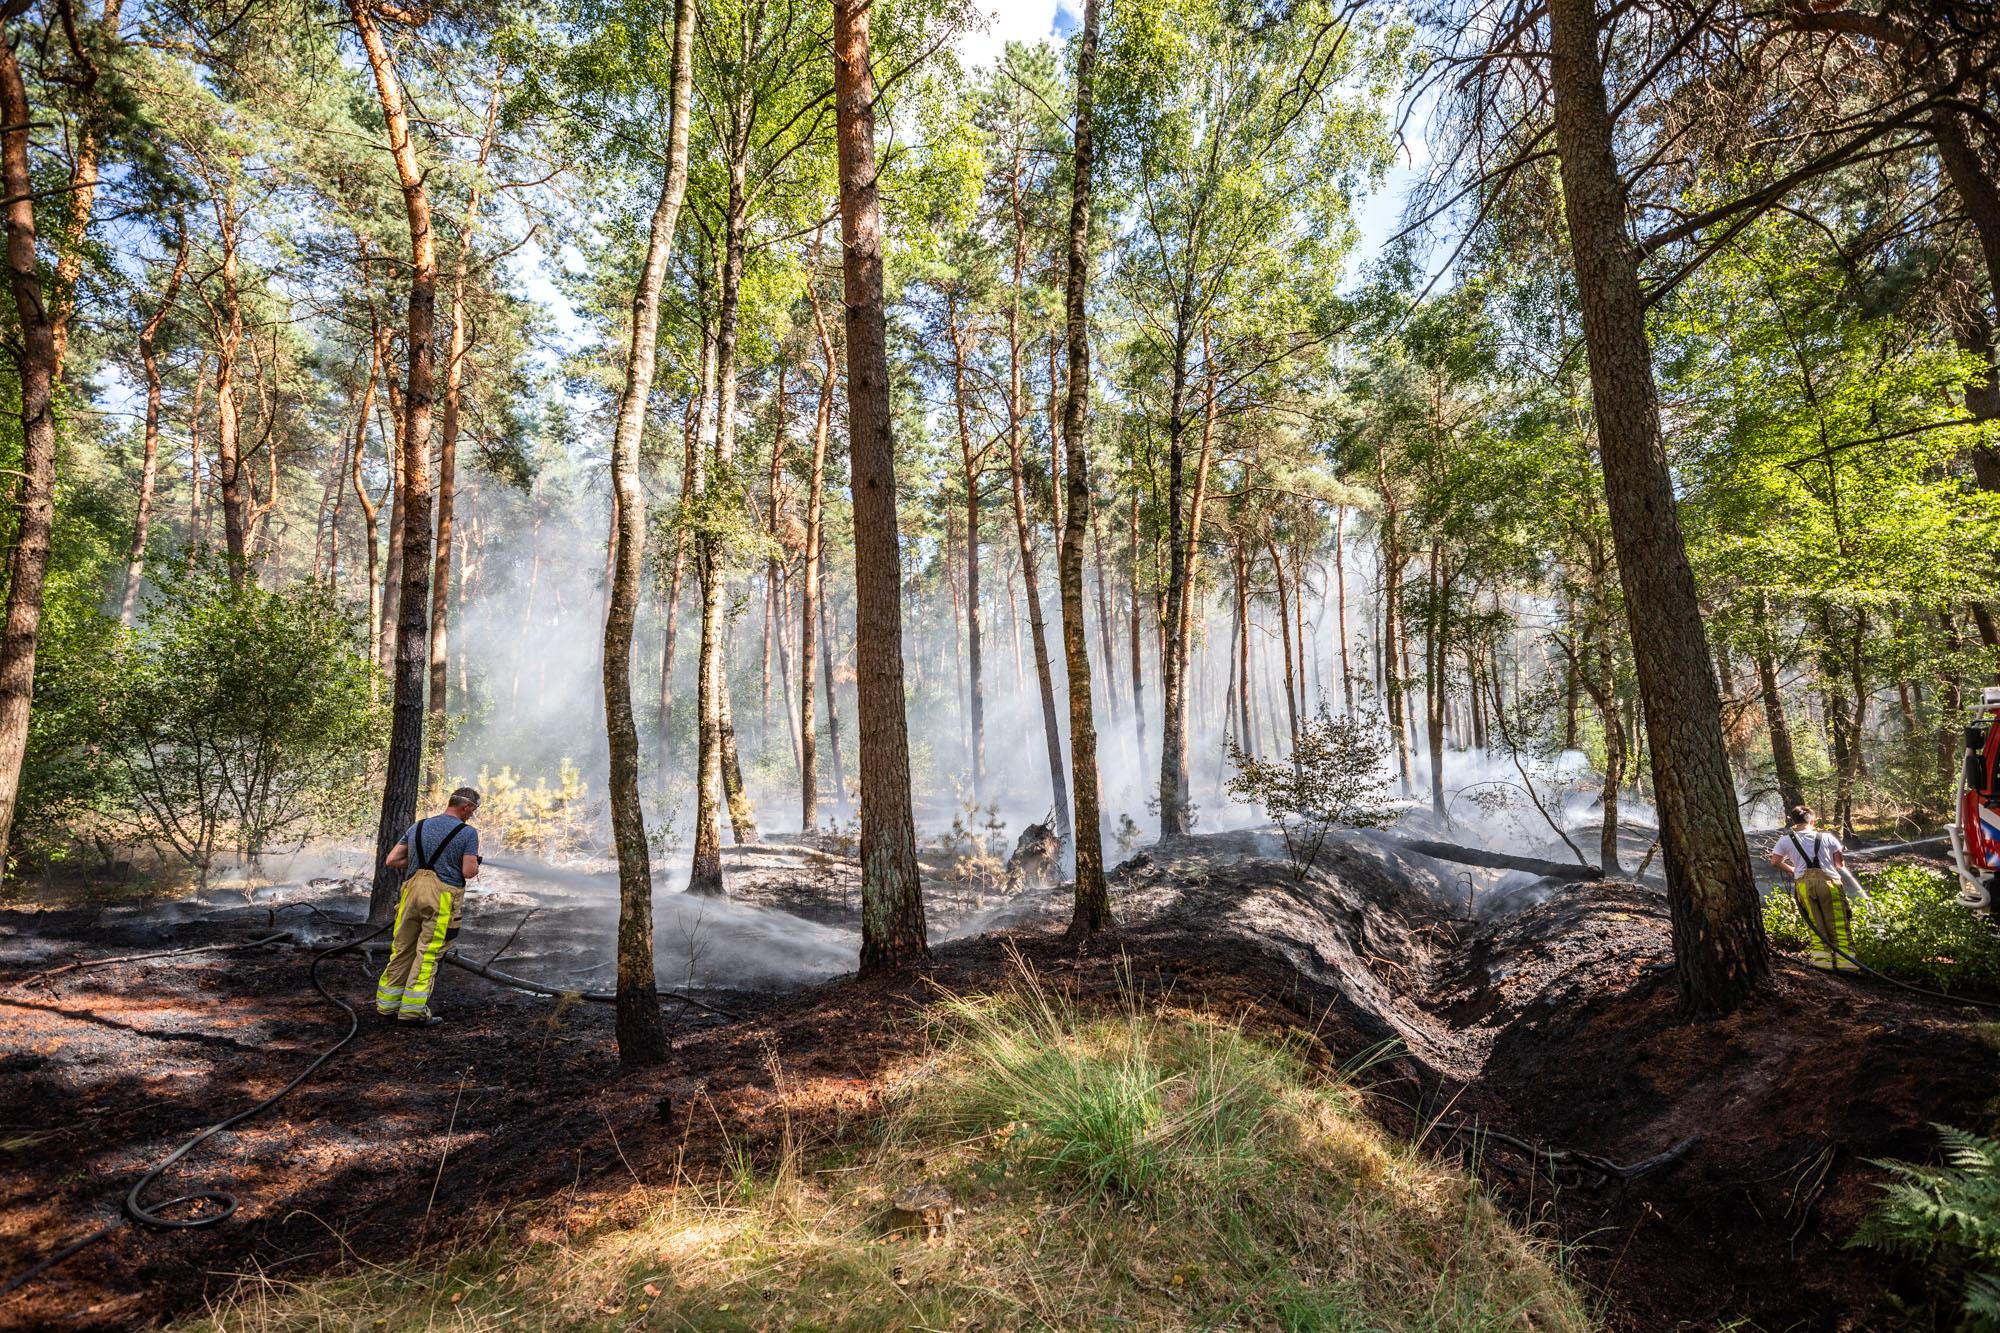 Brand in Sterrenbos tegenover camping Starnbosch, half